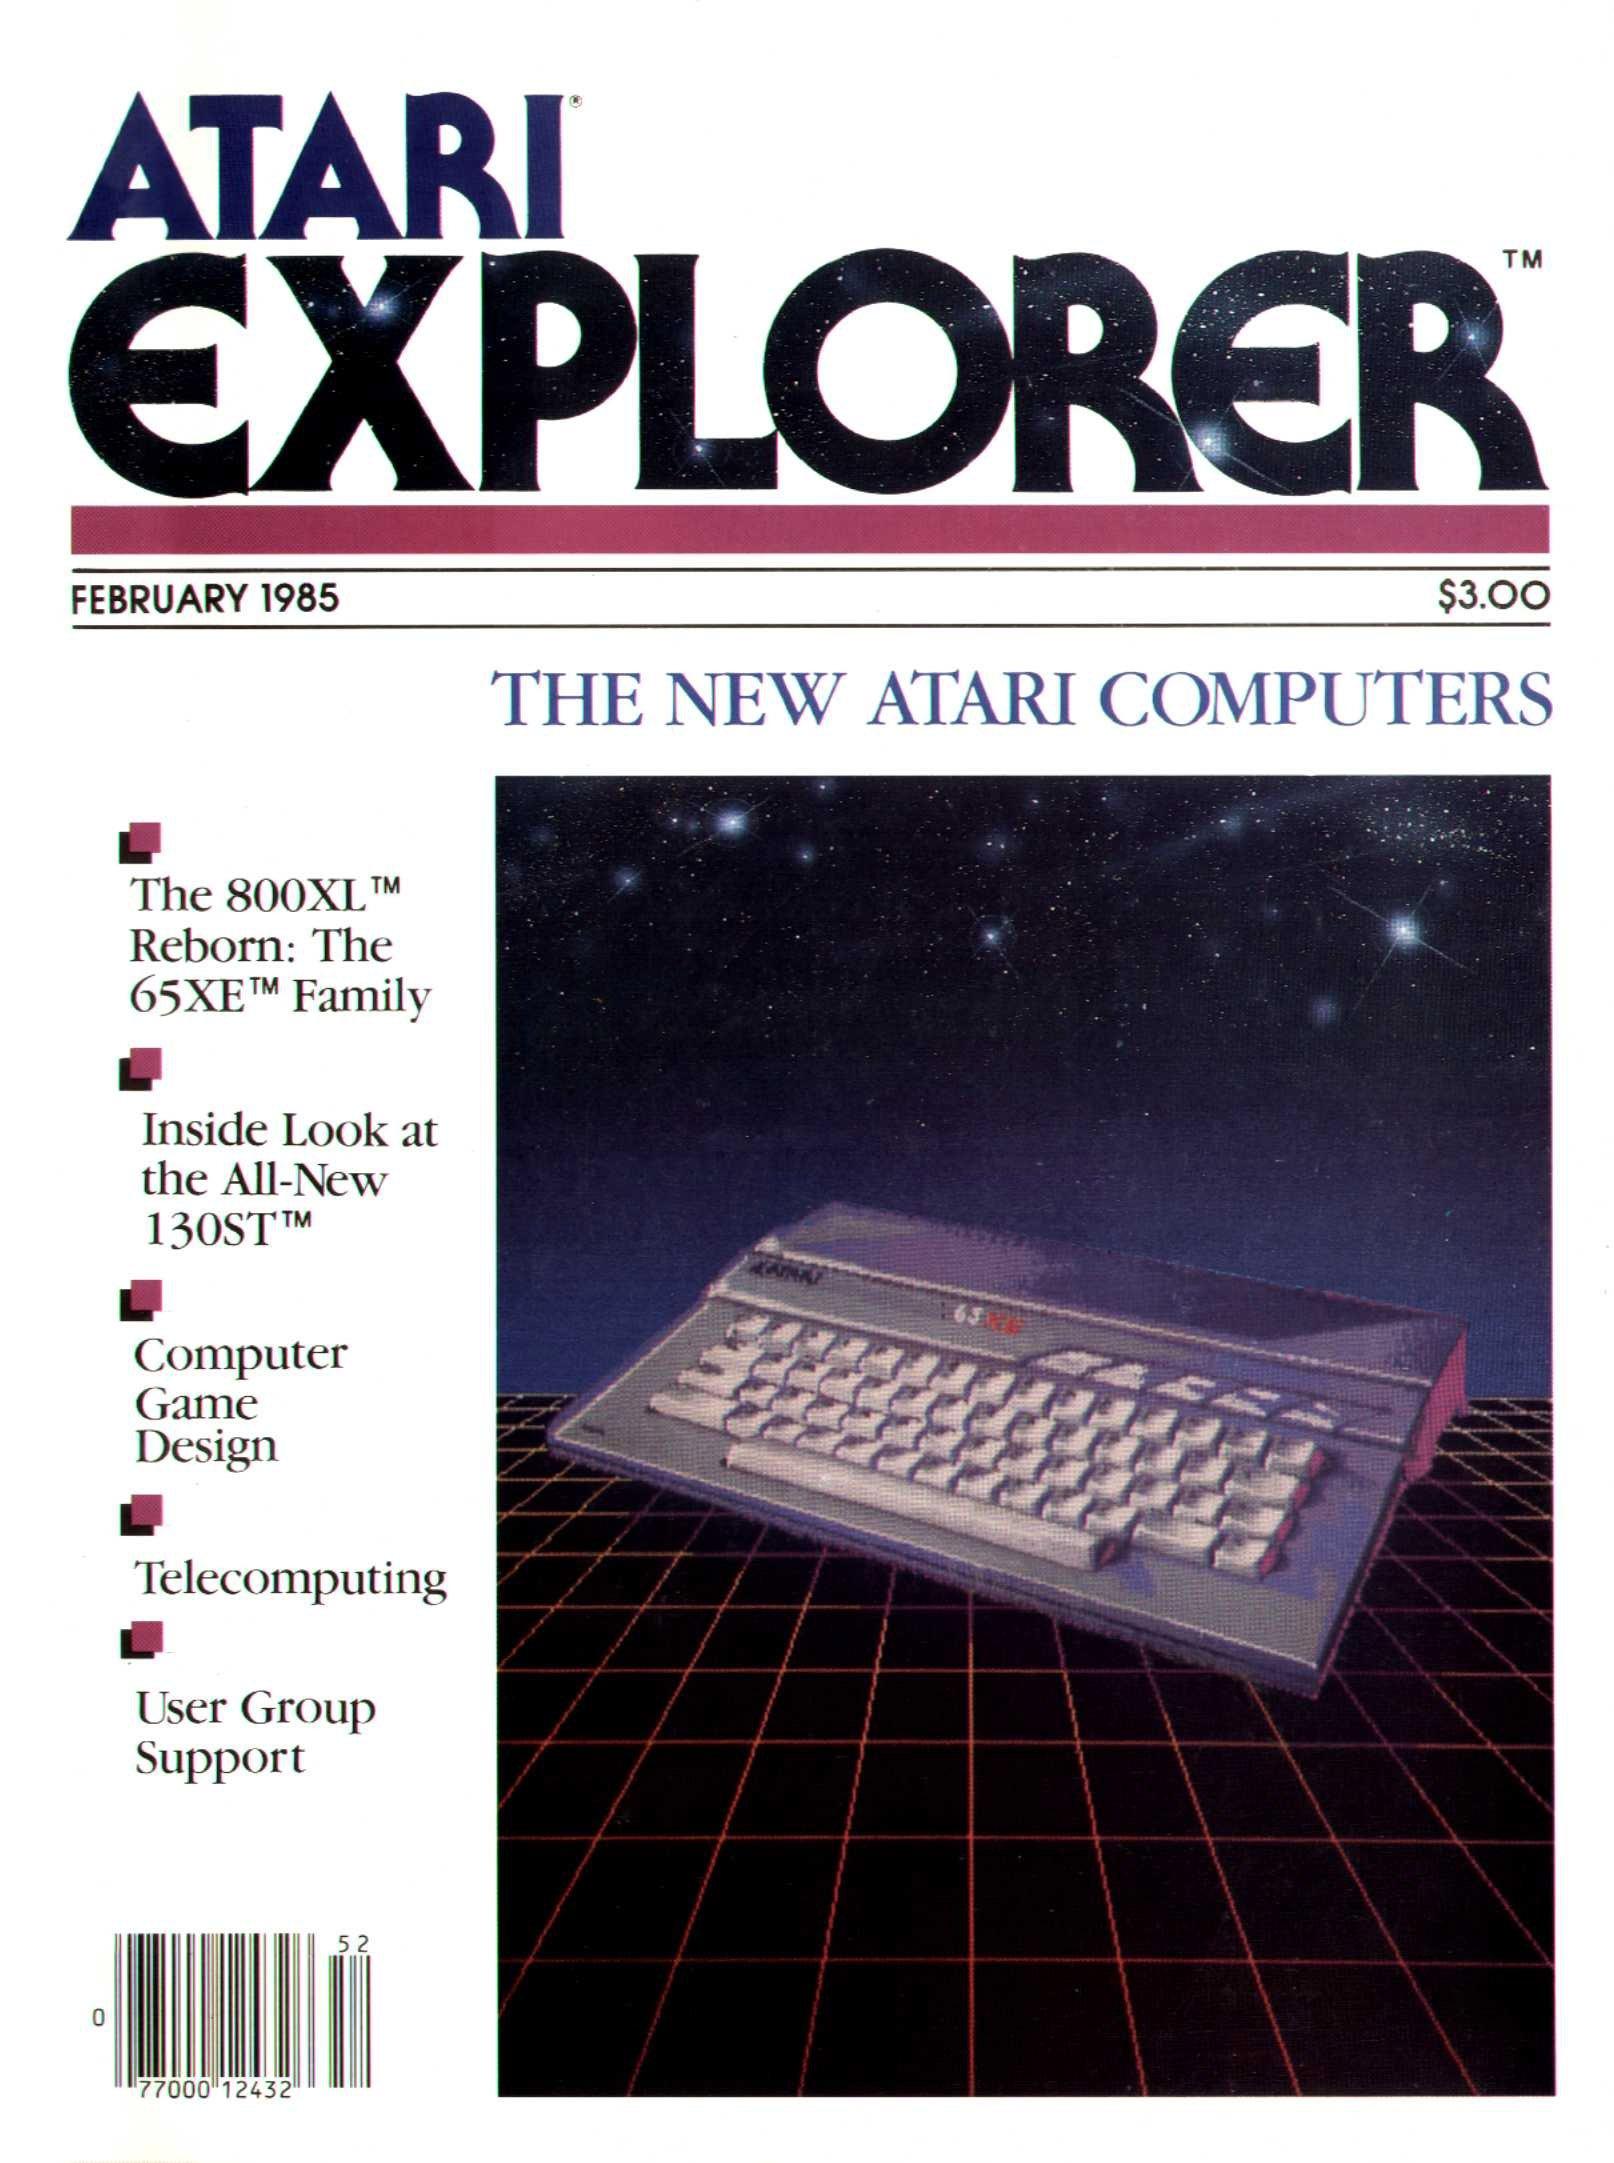 Atari Explorer Issue 01 (February 1985)